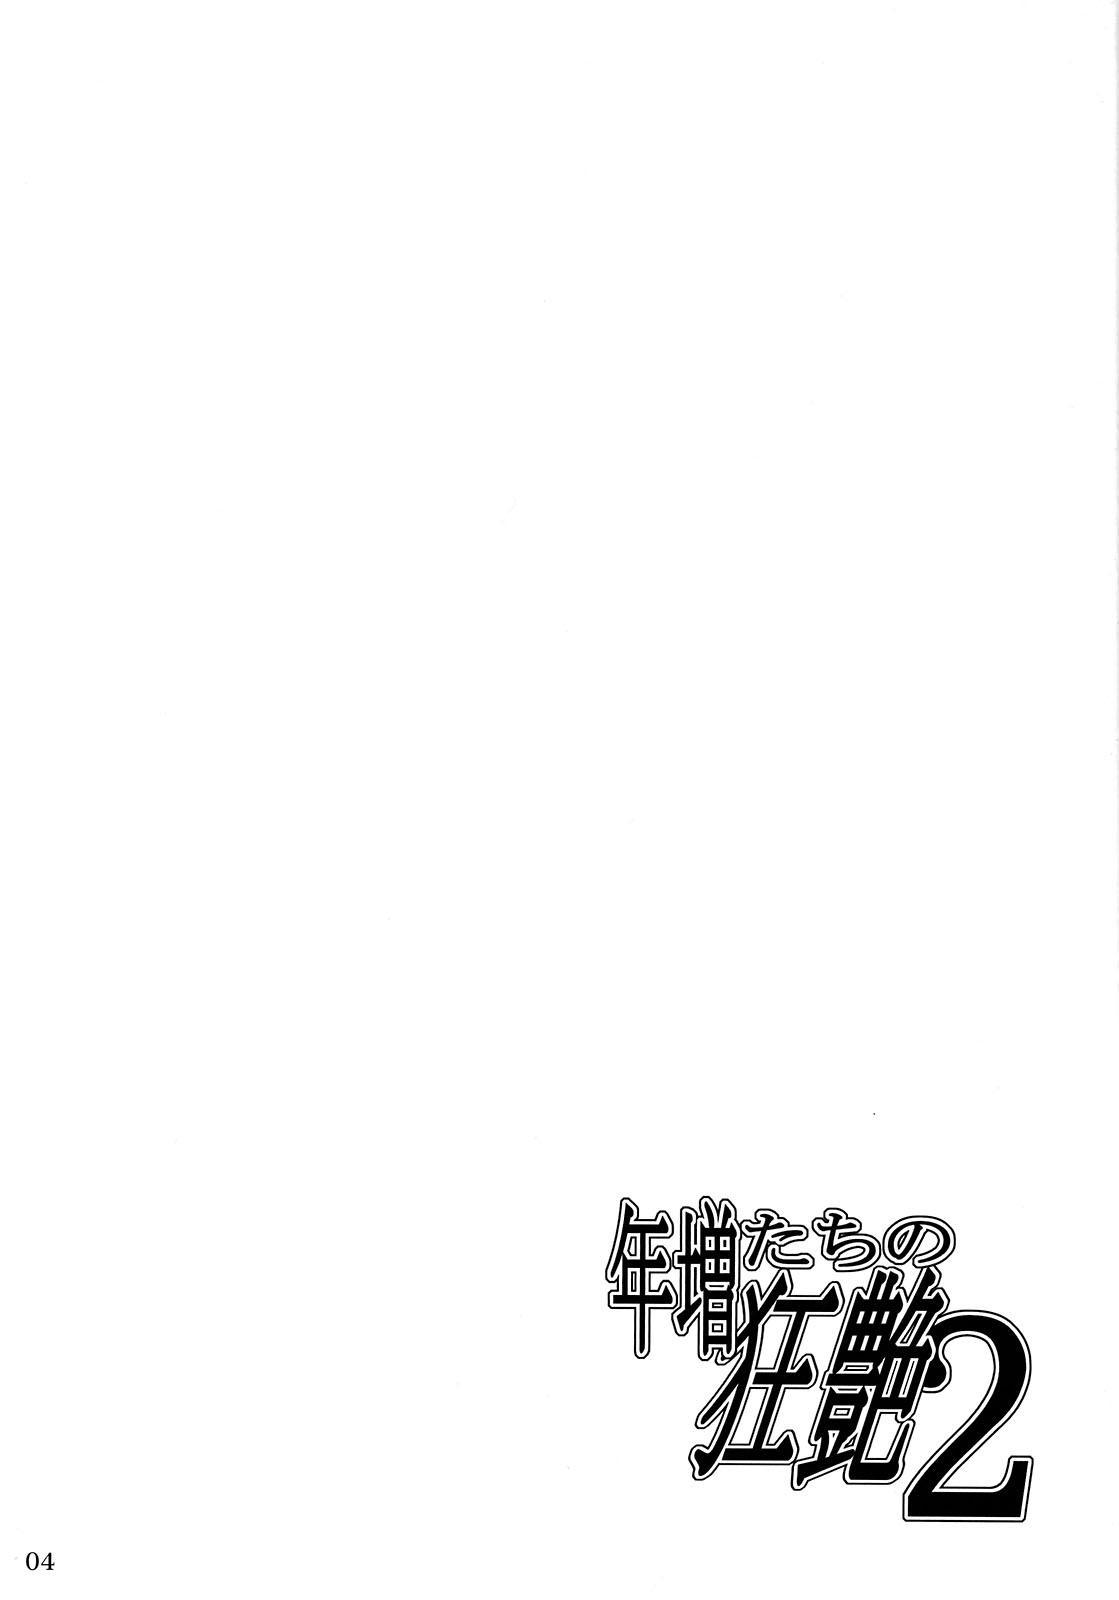 Toshima-tachi no Kyouen 2 3